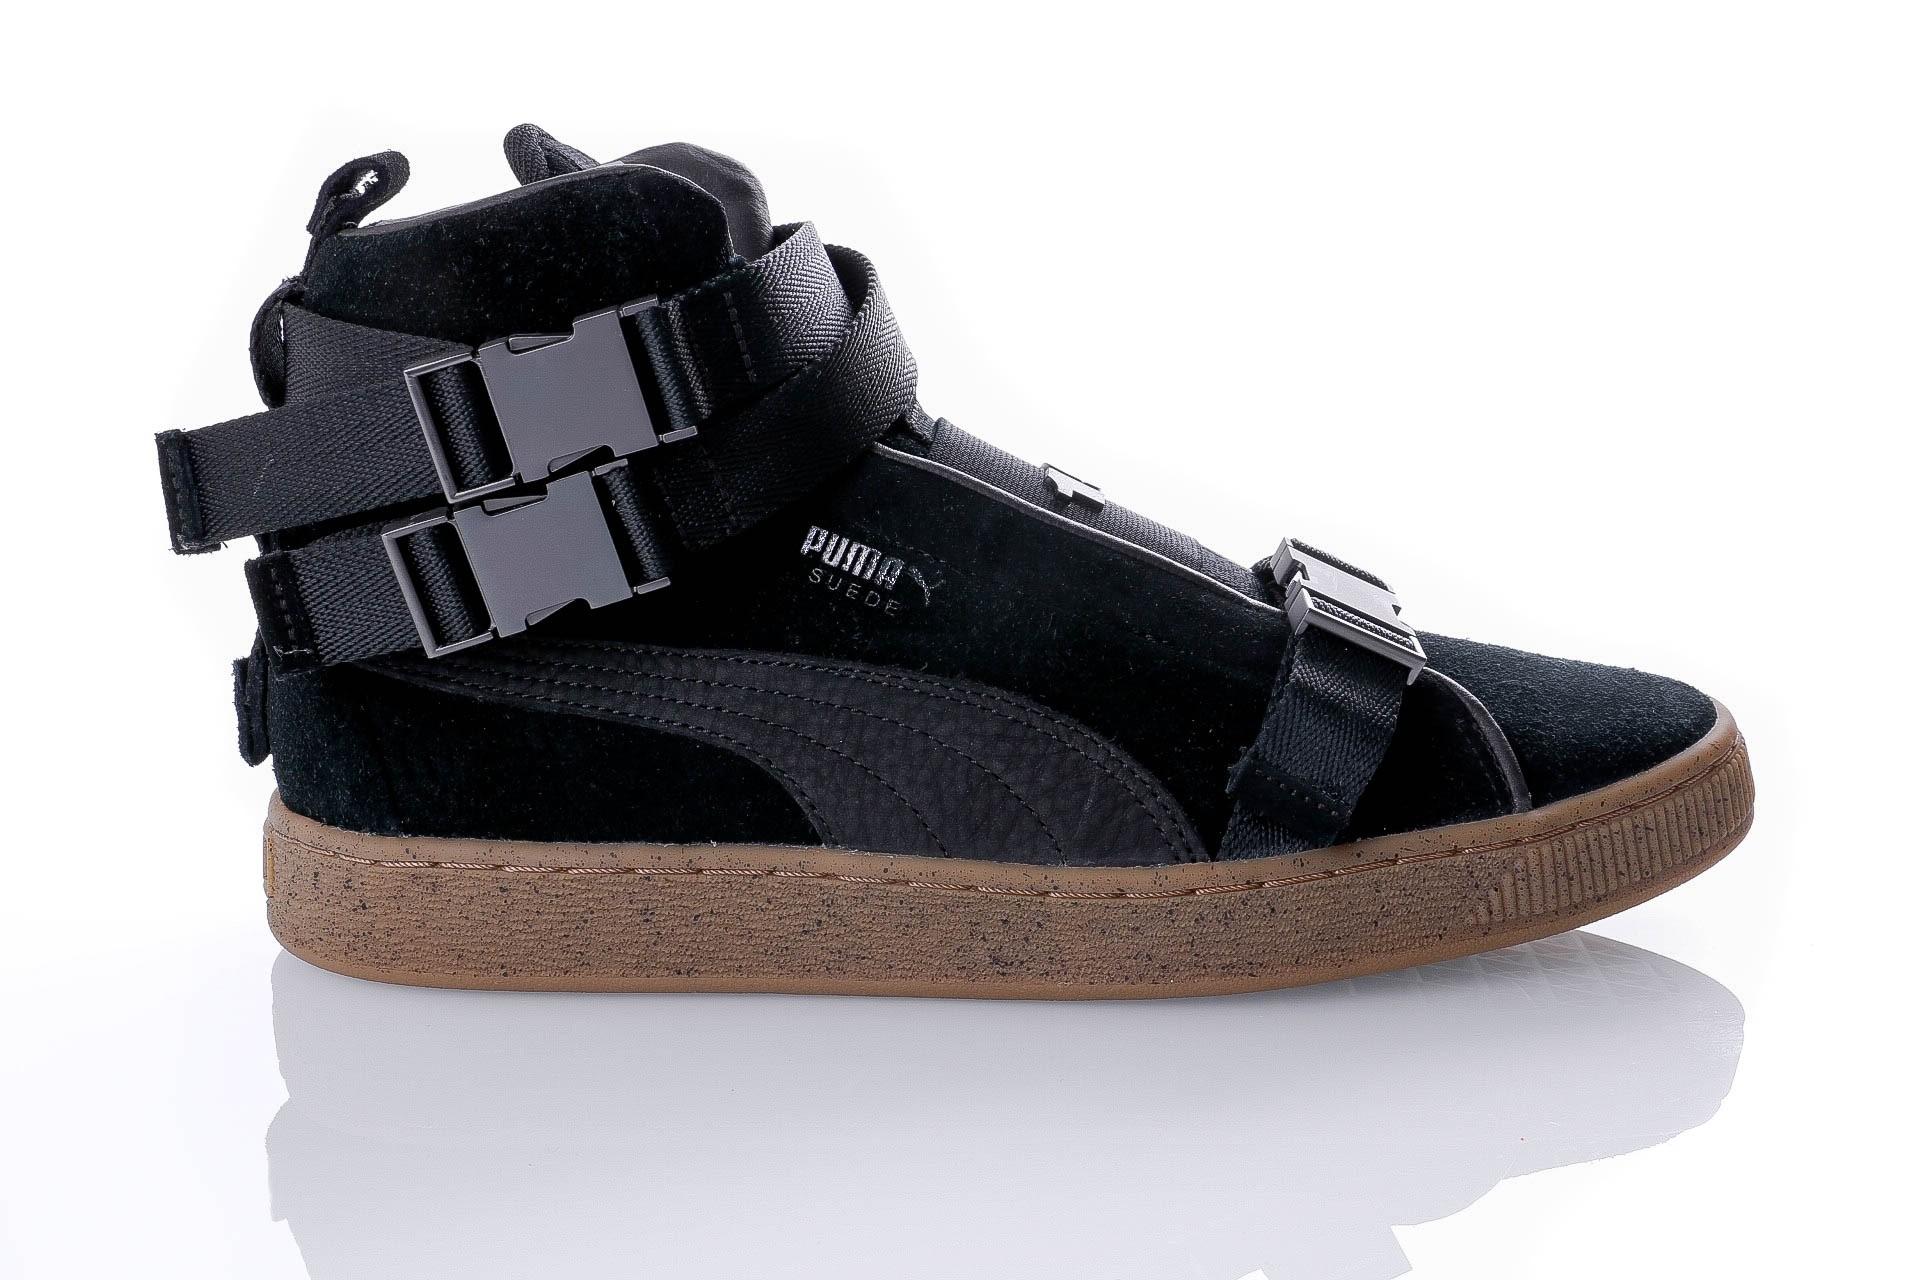 Foto van Puma Suede Classic x TheWeeknd 366310 01 Sneakers Puma Black-Puma Black